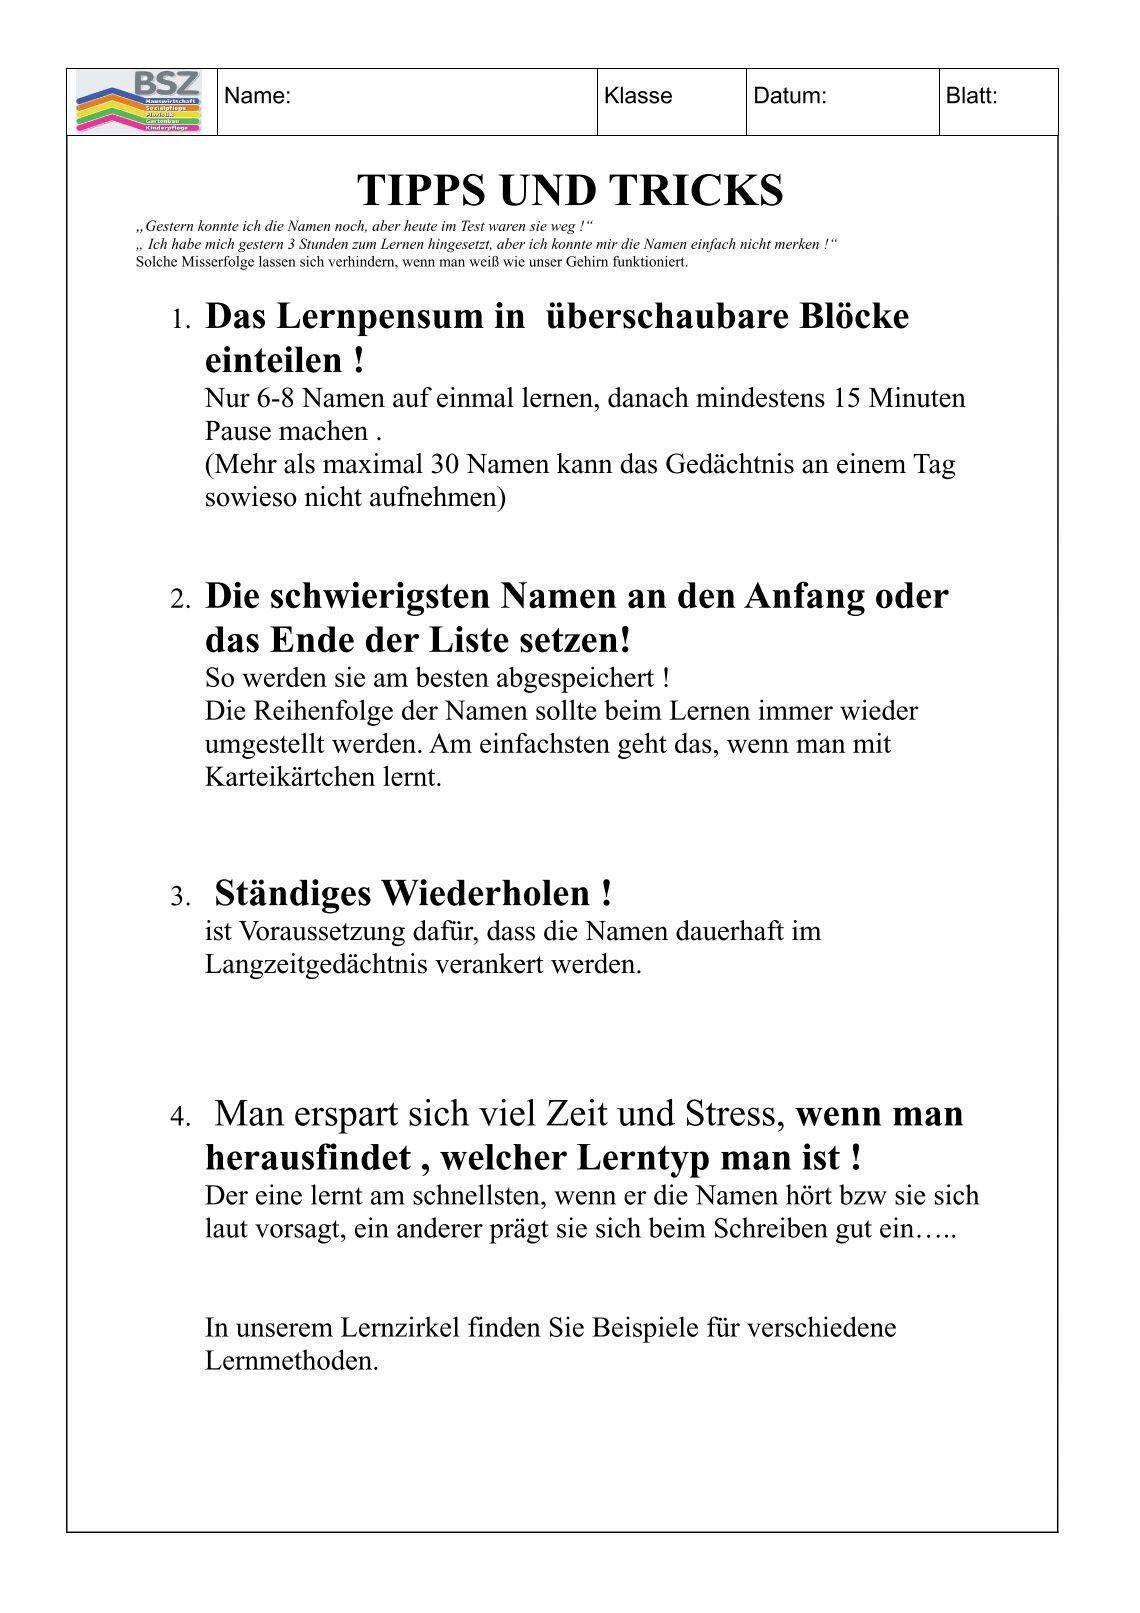 2 free magazines from bsz regensburg de